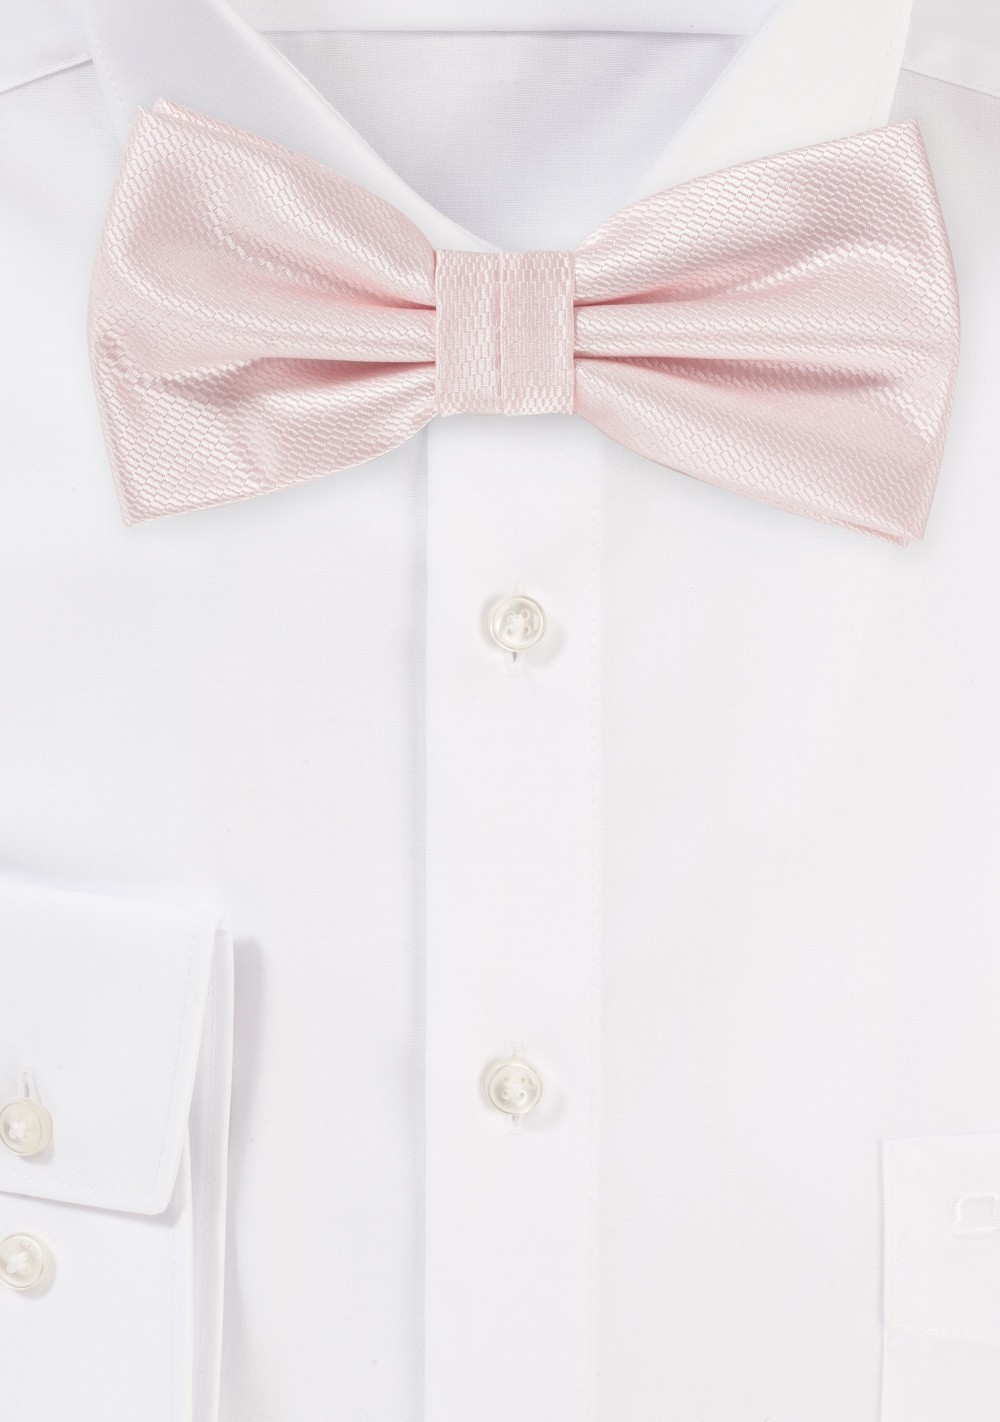 Bridal Bow Tie in Soft Blush